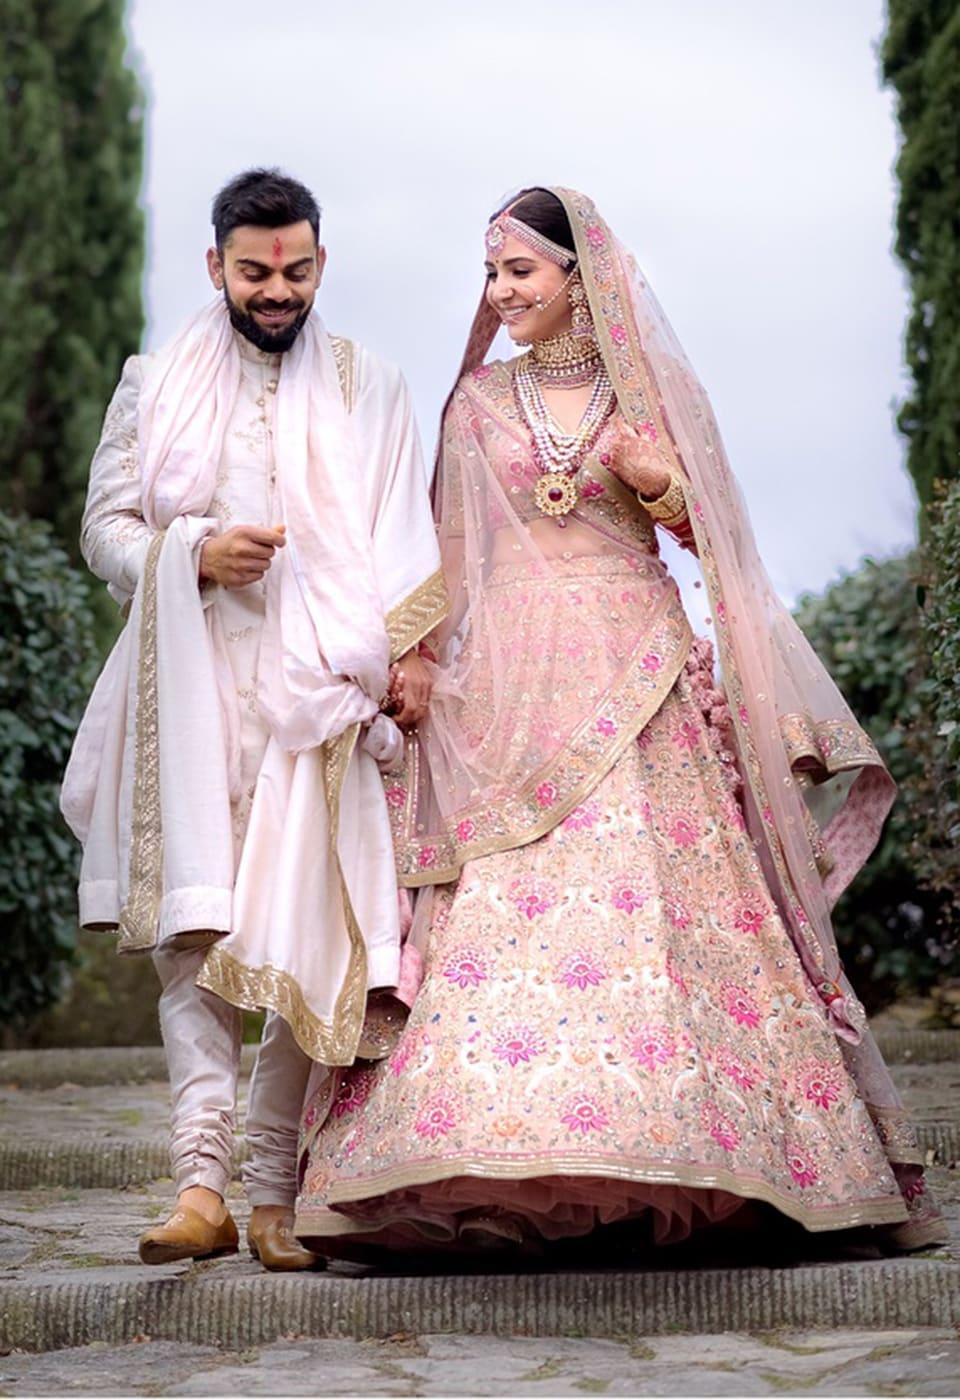 Dazzlerr: Flashback- A look at the Anushka Sharma's Wedding Outfits